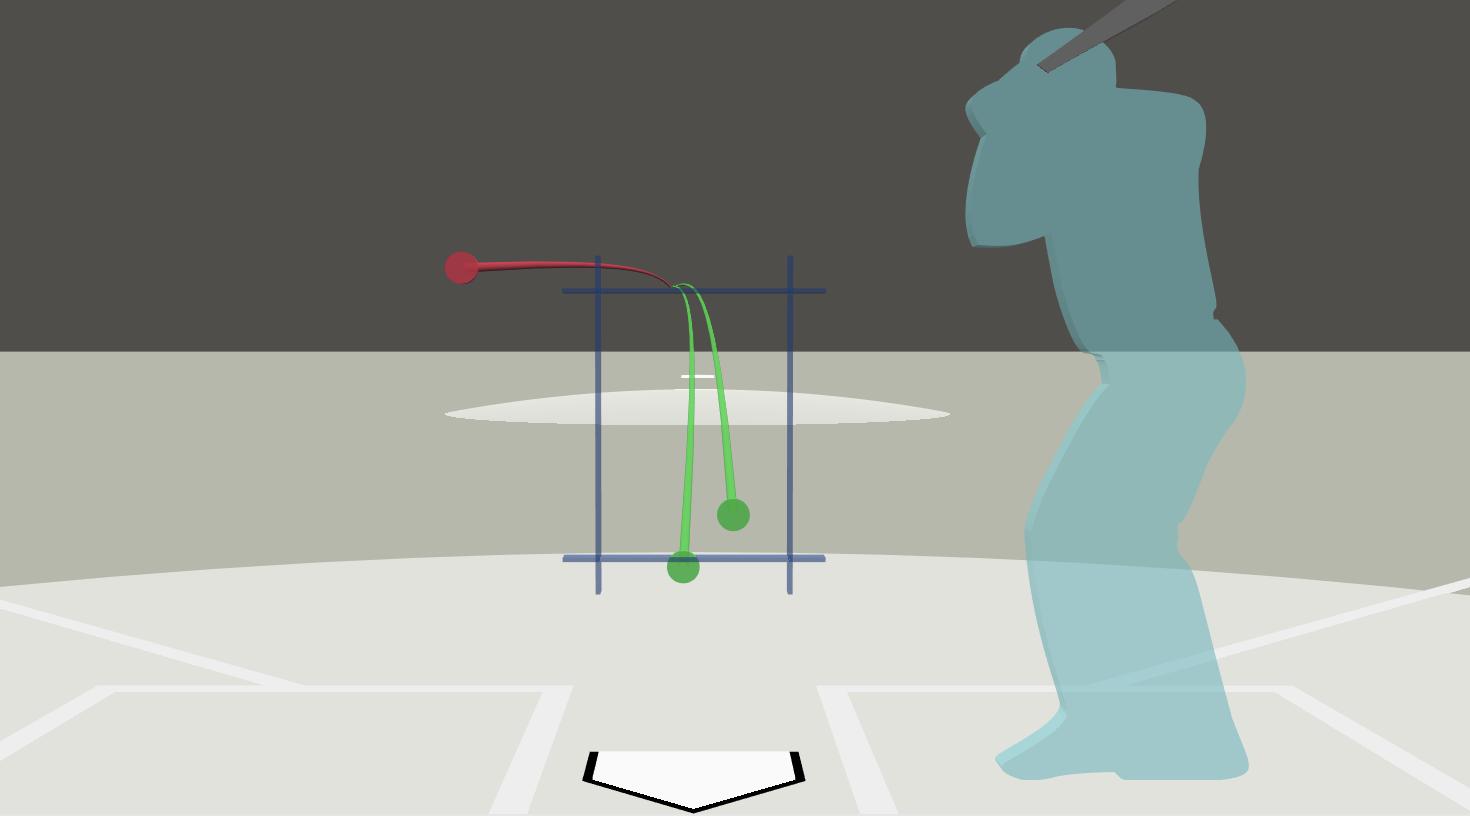 MLB Pitching Coach: Rick Peterson - Effective Change-up usage